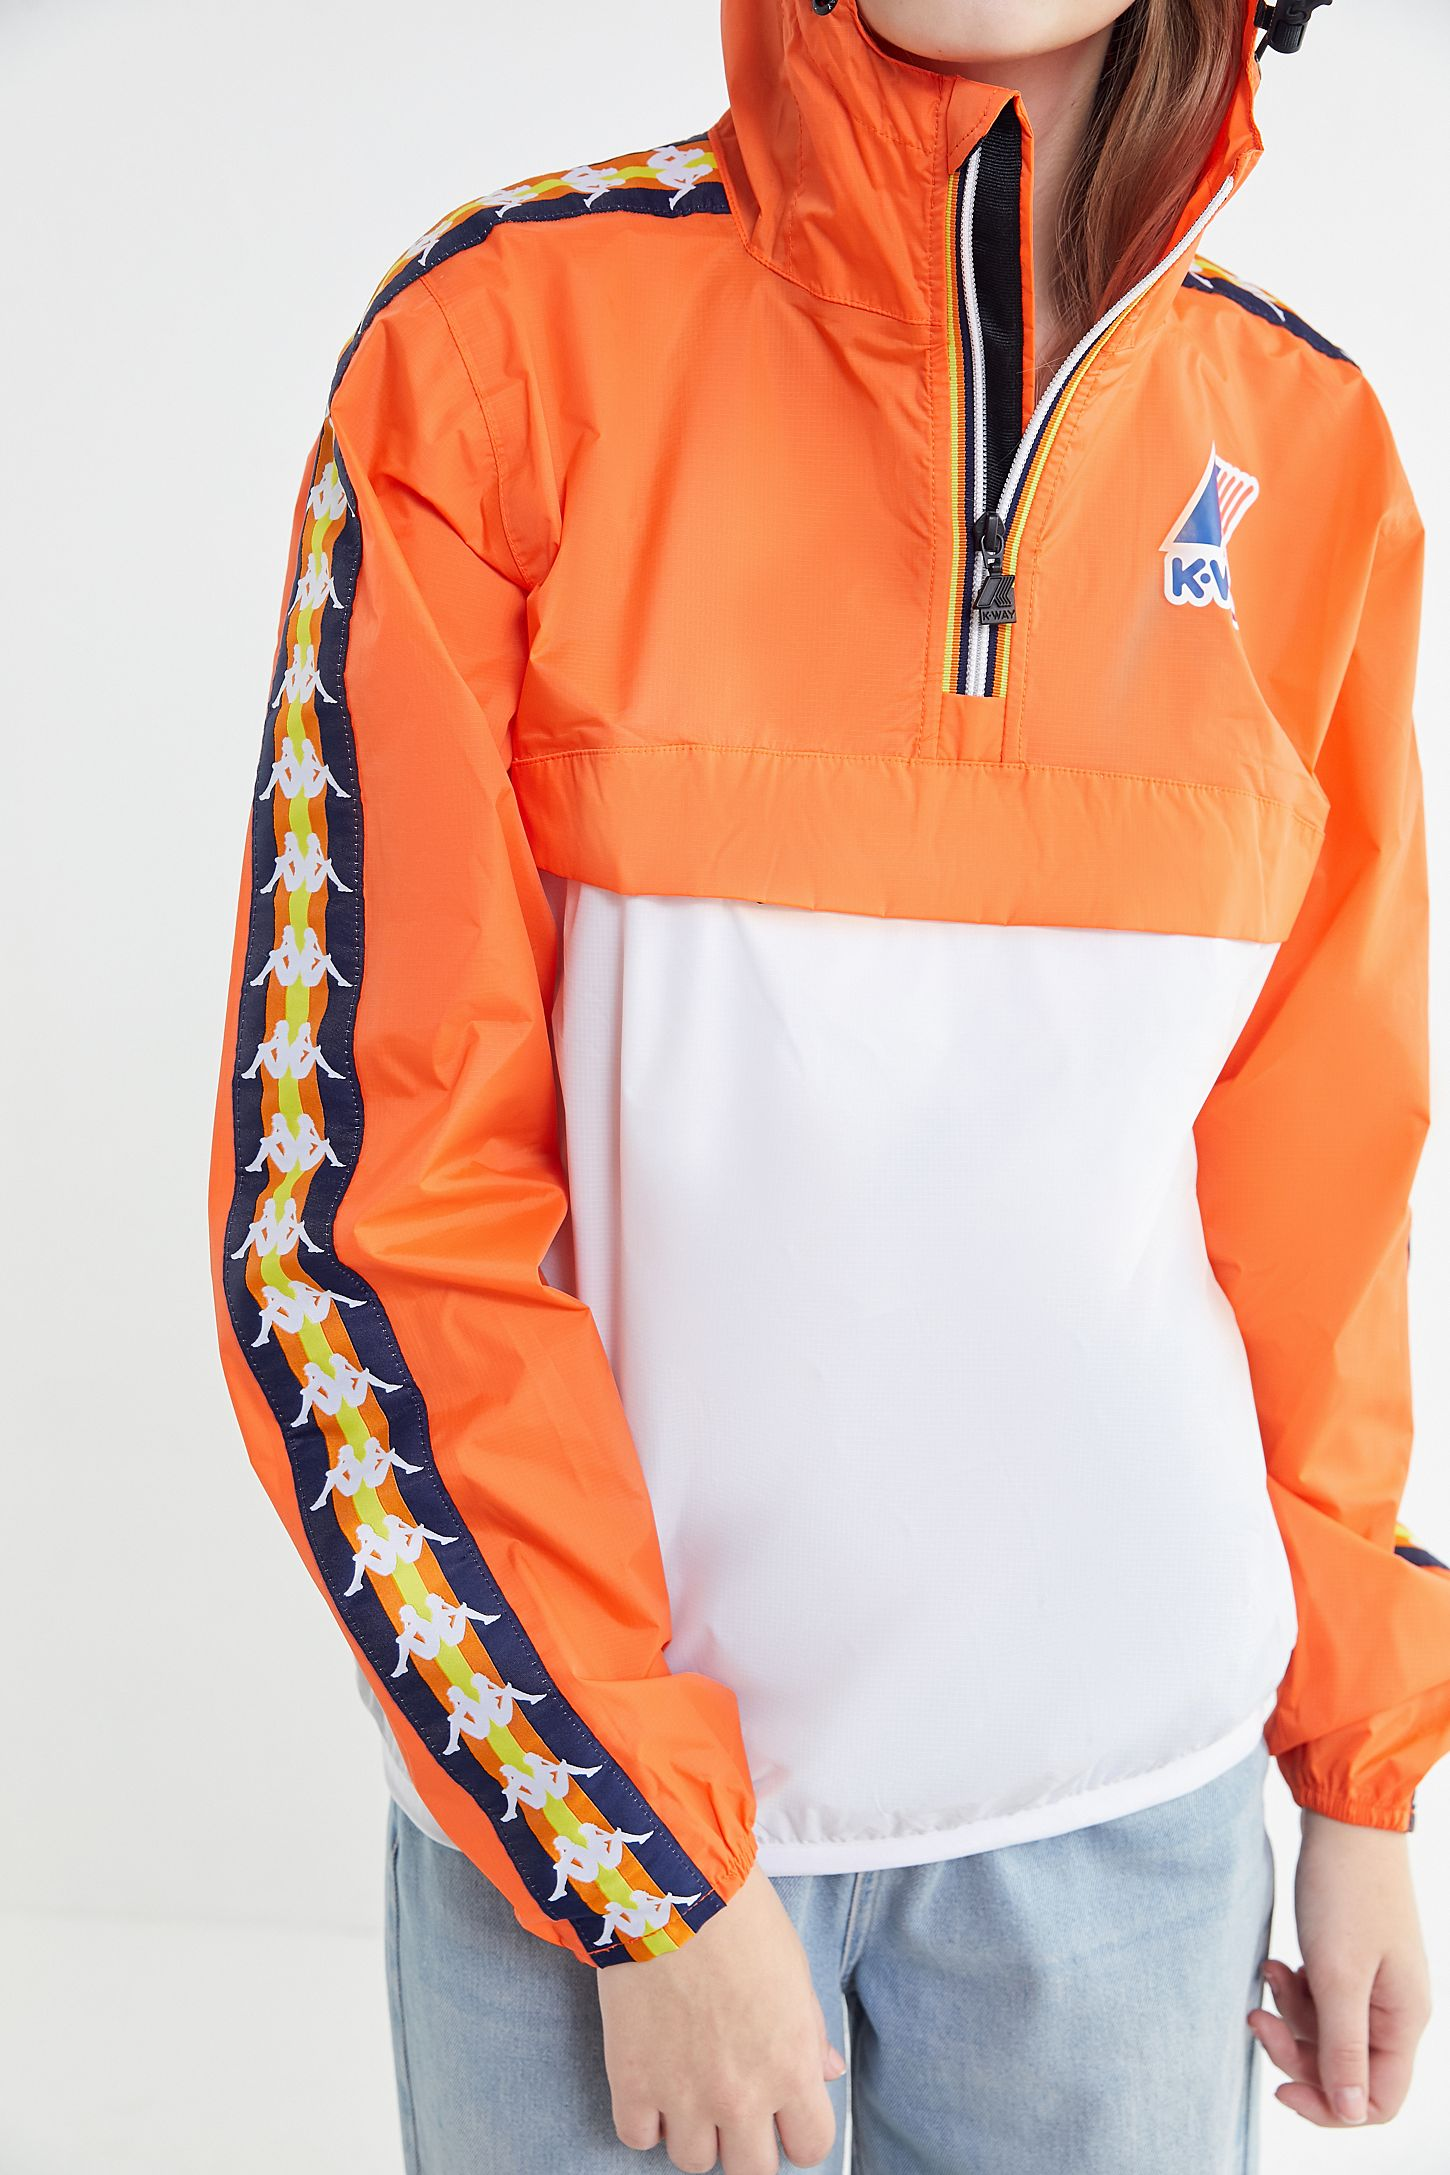 73fb0763b8 Kappa X K-Way Le Vrai Leon Popover Jacket